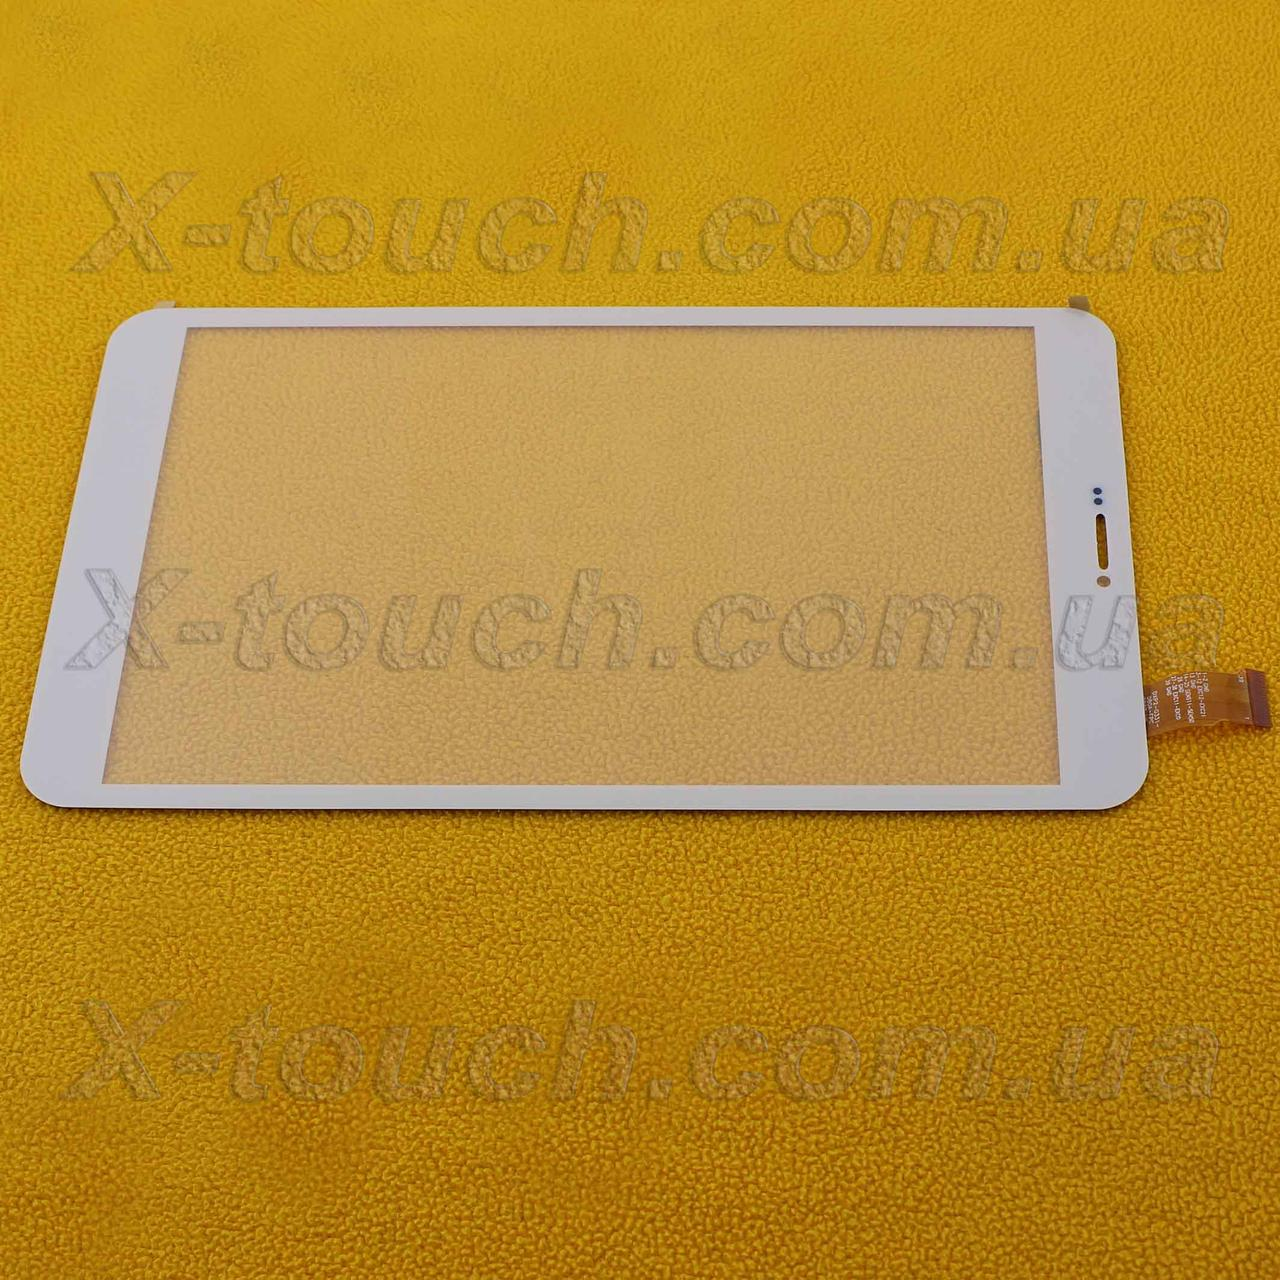 Тачскрин, сенсор Tesla Neon 8.0 8Gb 3G для планшета, цвета белый